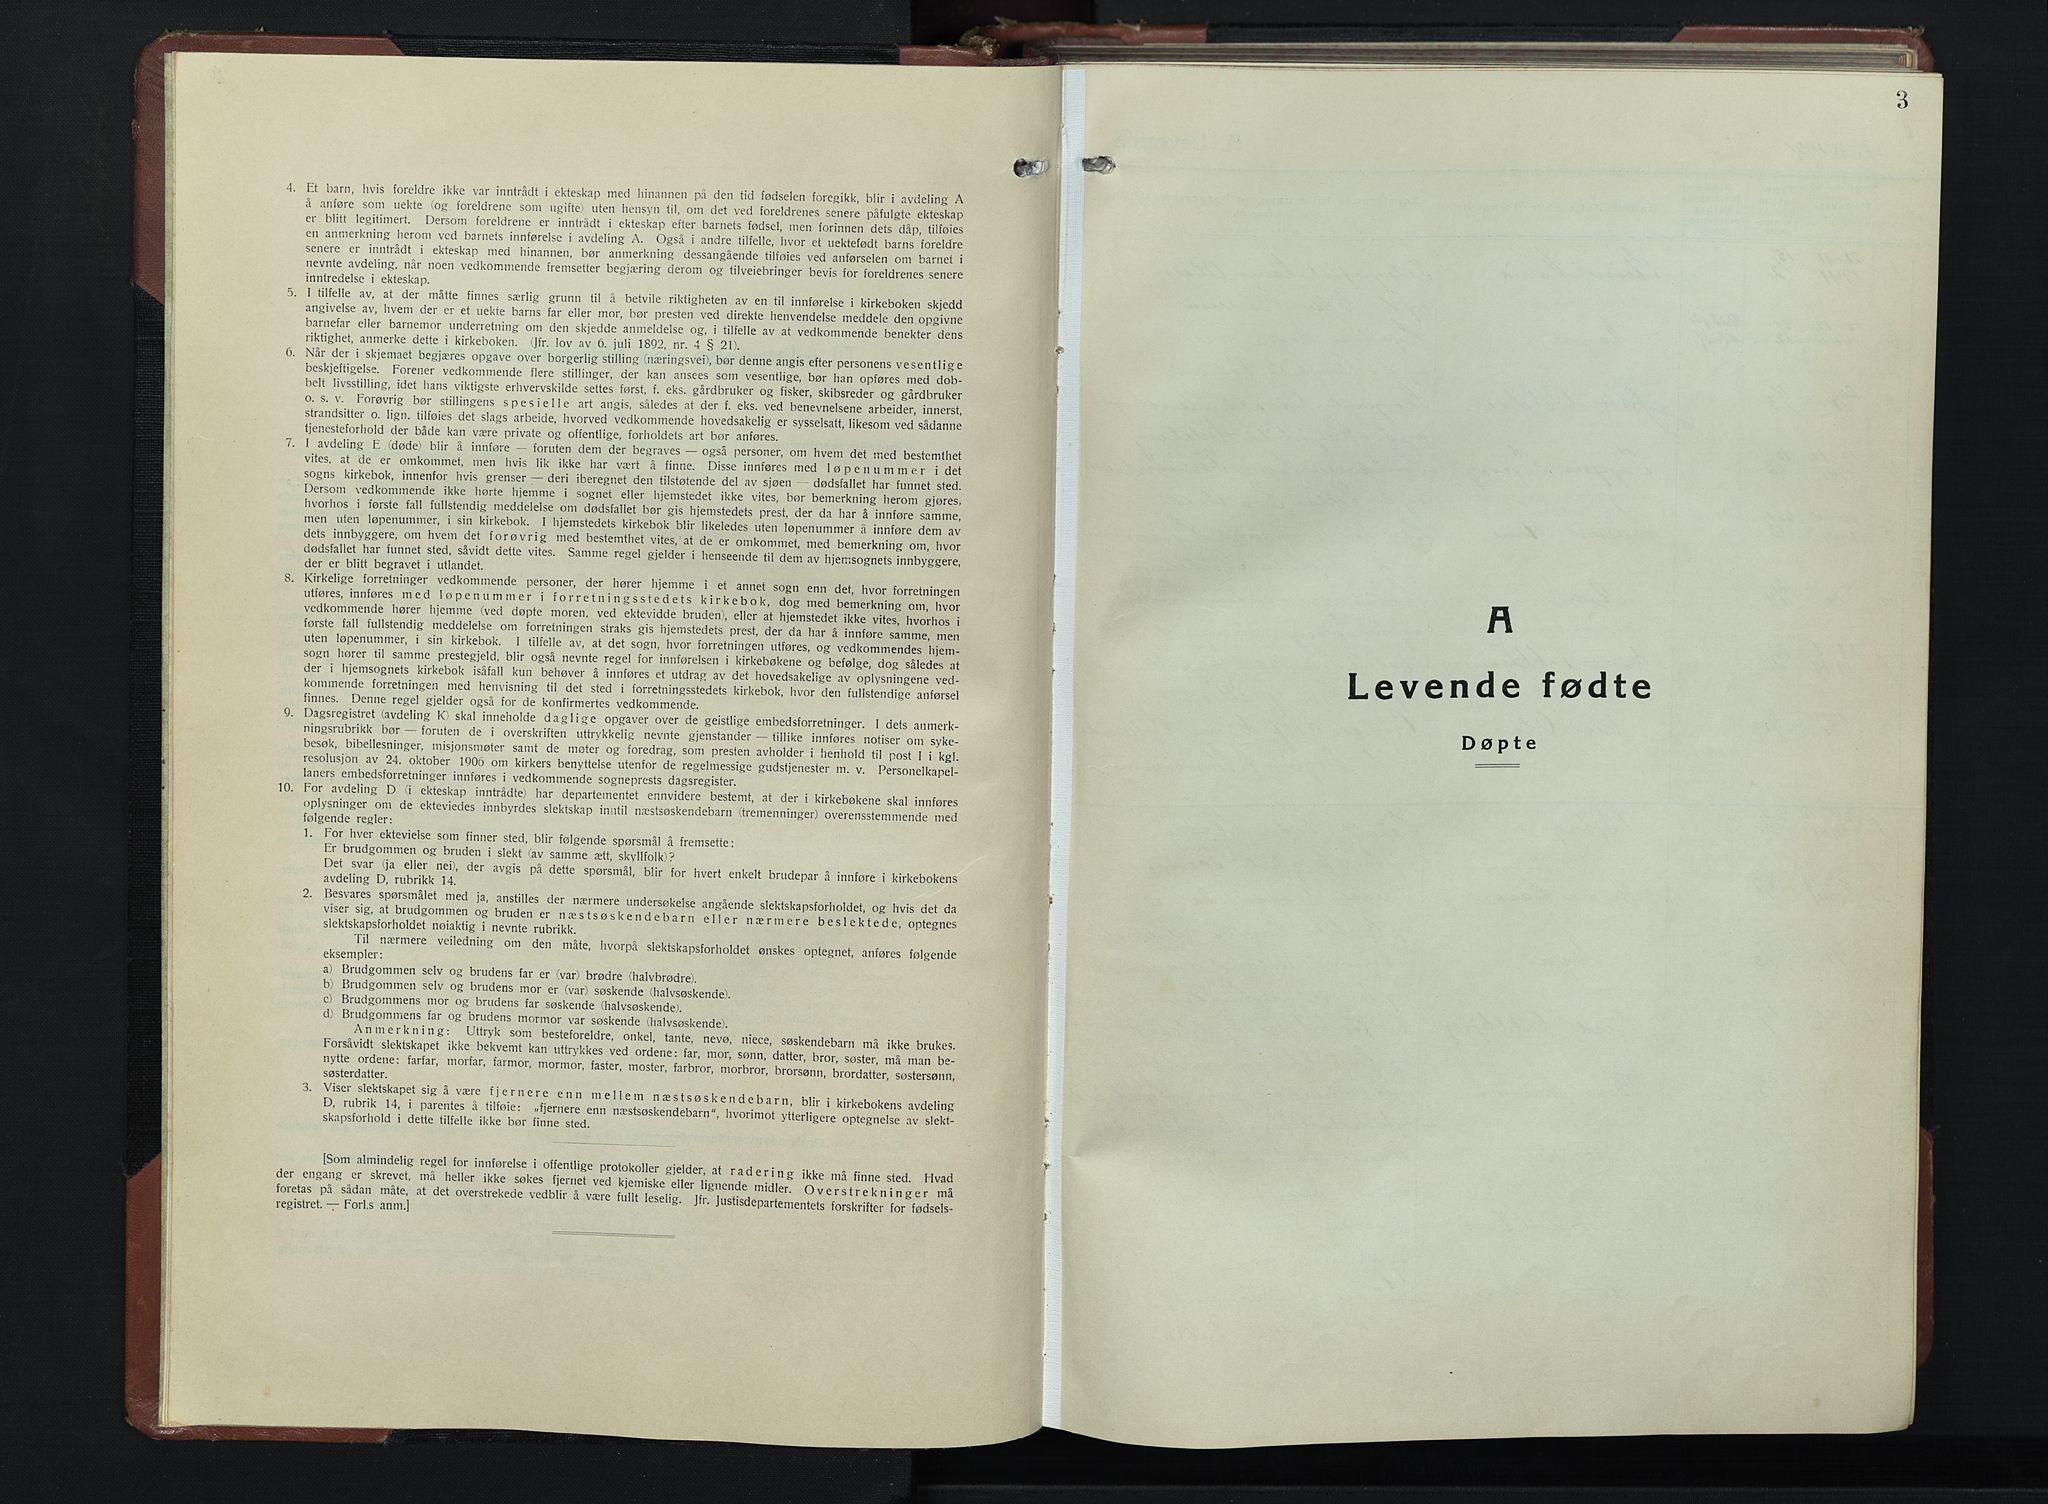 SAH, Vardal prestekontor, H/Ha/Hab/L0019: Klokkerbok nr. 19, 1941-1951, s. 3